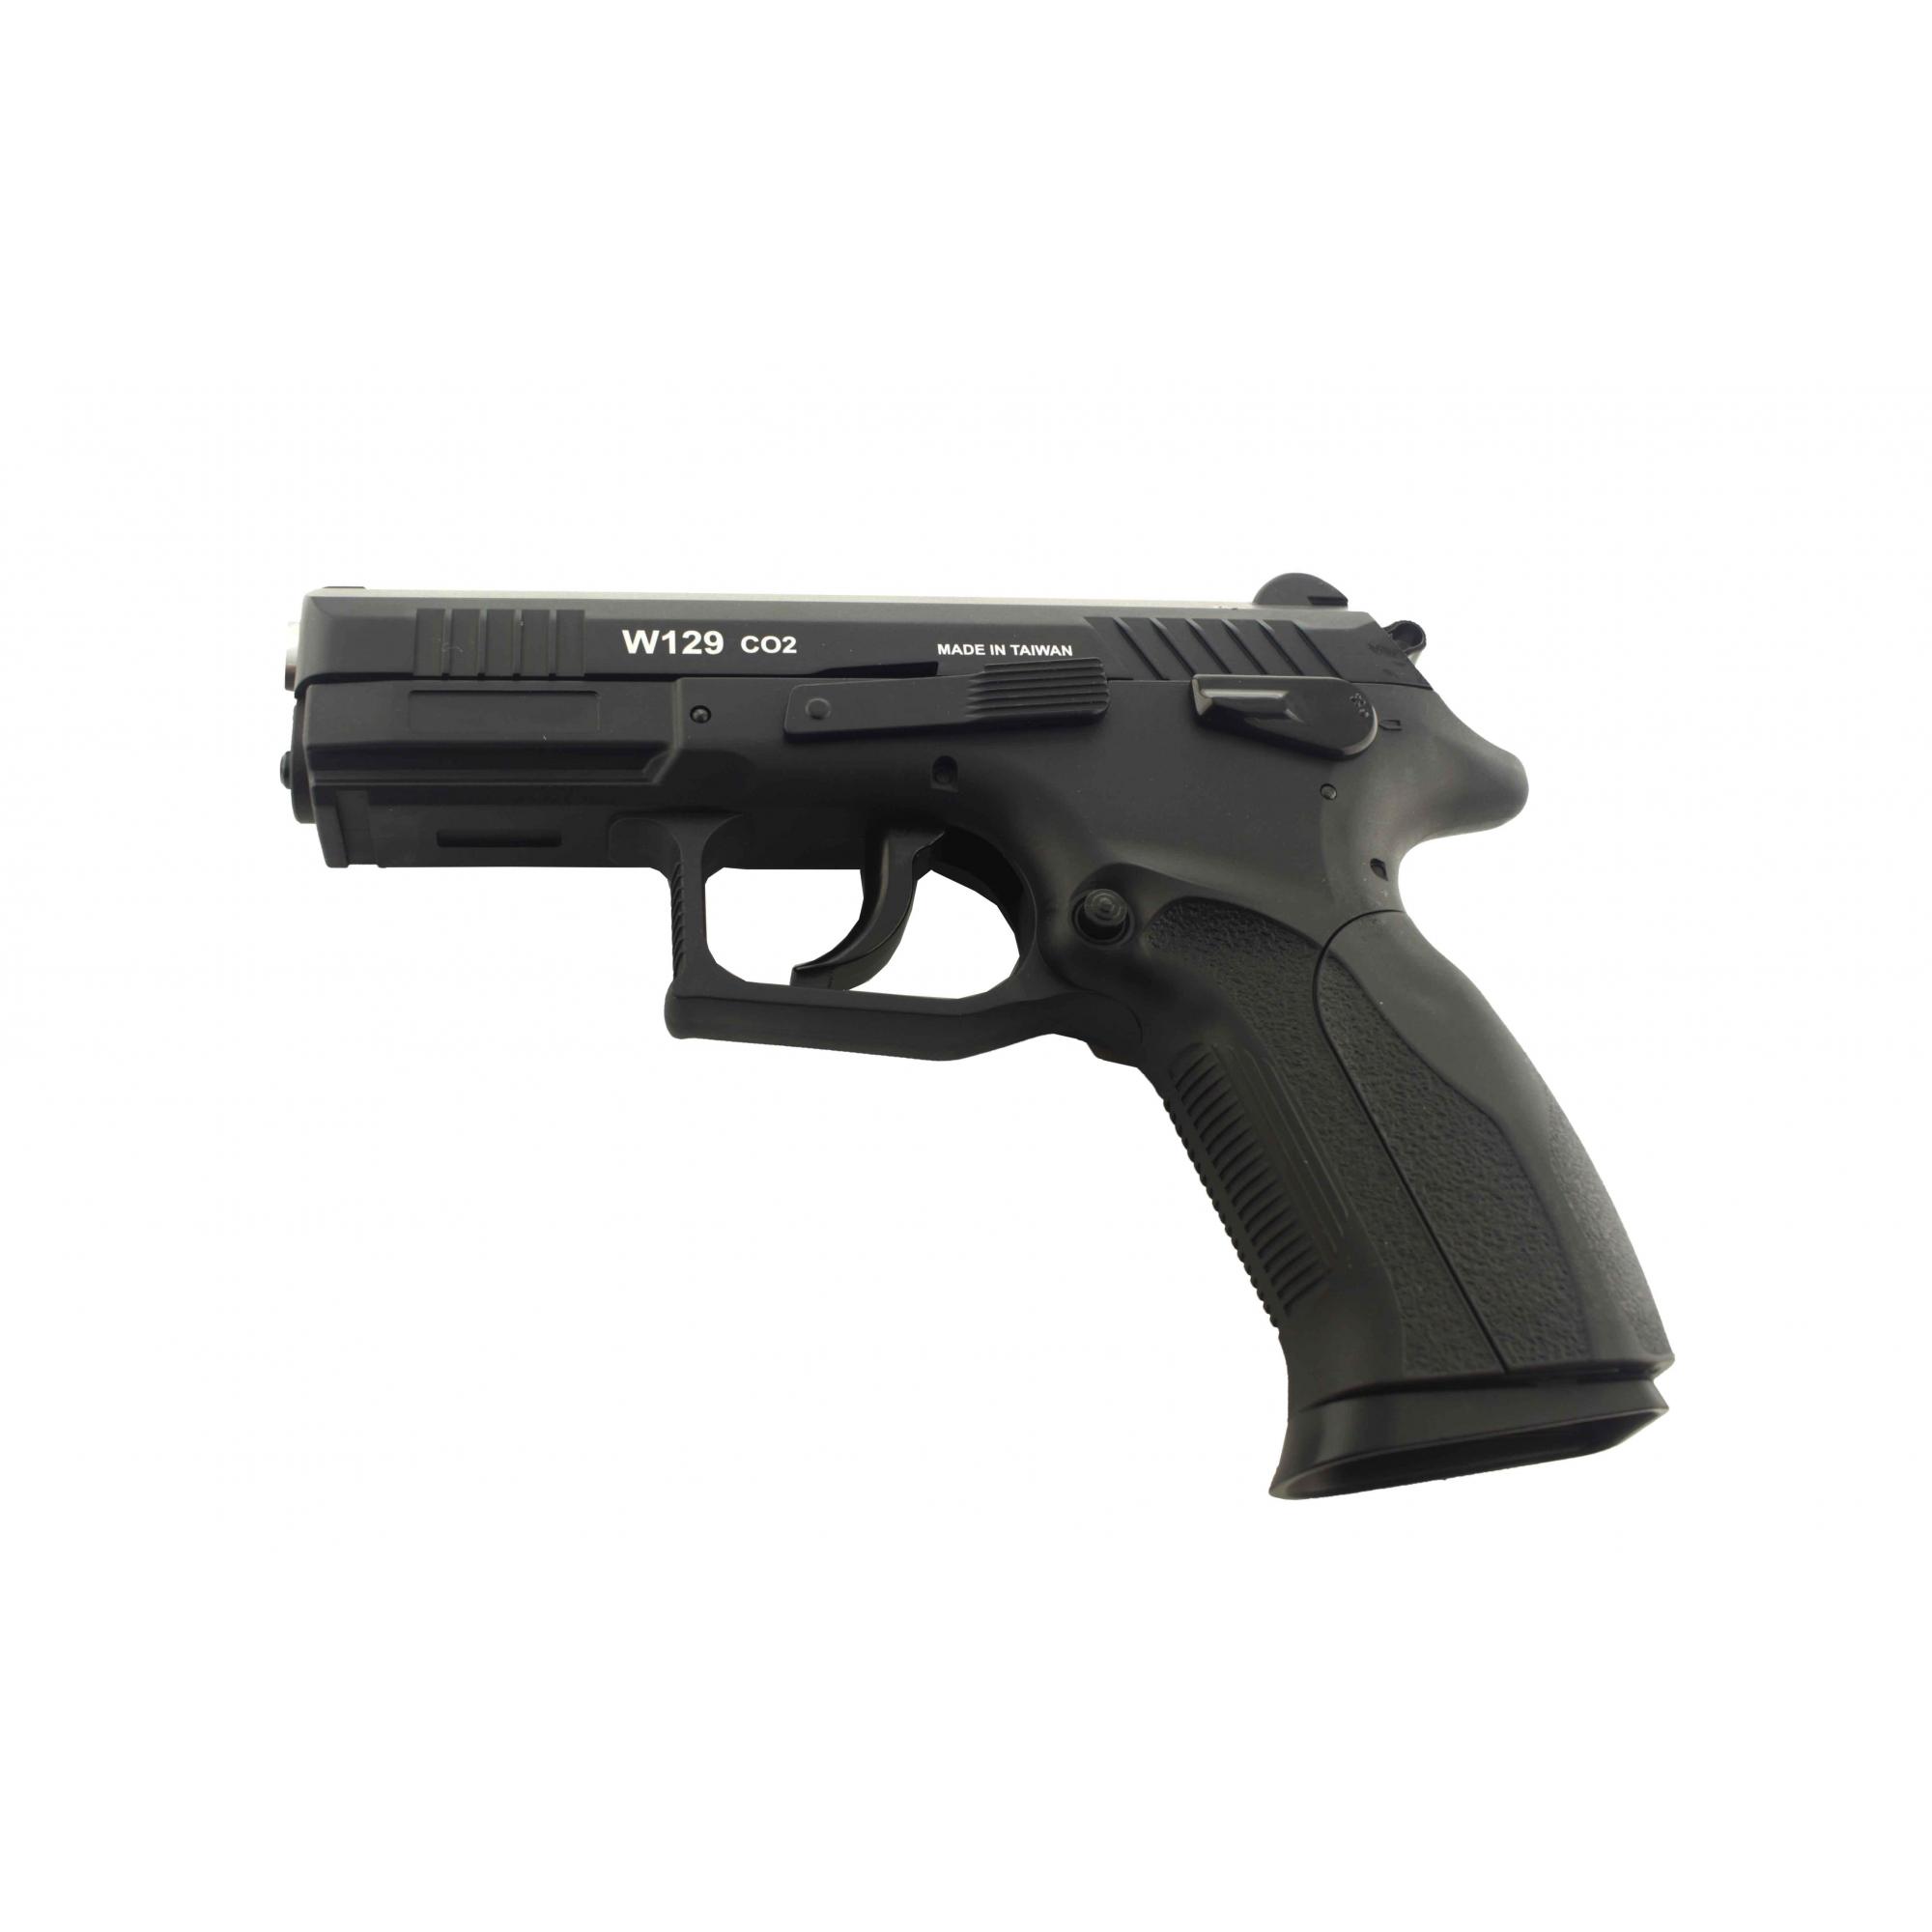 Pistola de Pressão Wingun W129 Slide Metal CO2 4,5mm